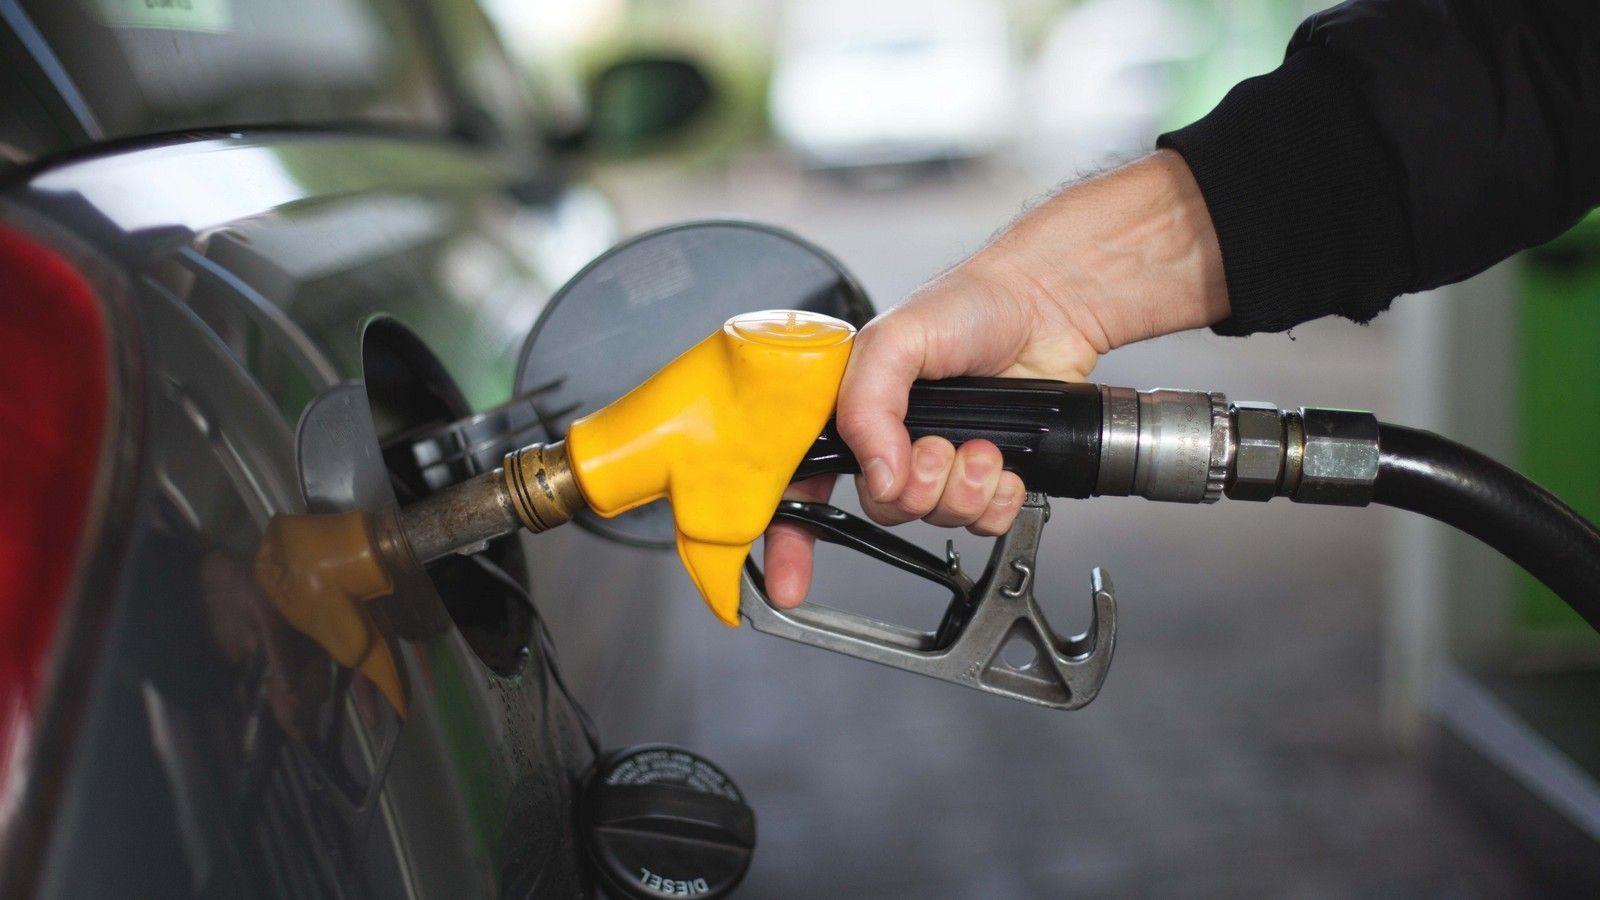 В Казахстане с начала года снизились цены на бензин и дизтопливо- Kapital.kz